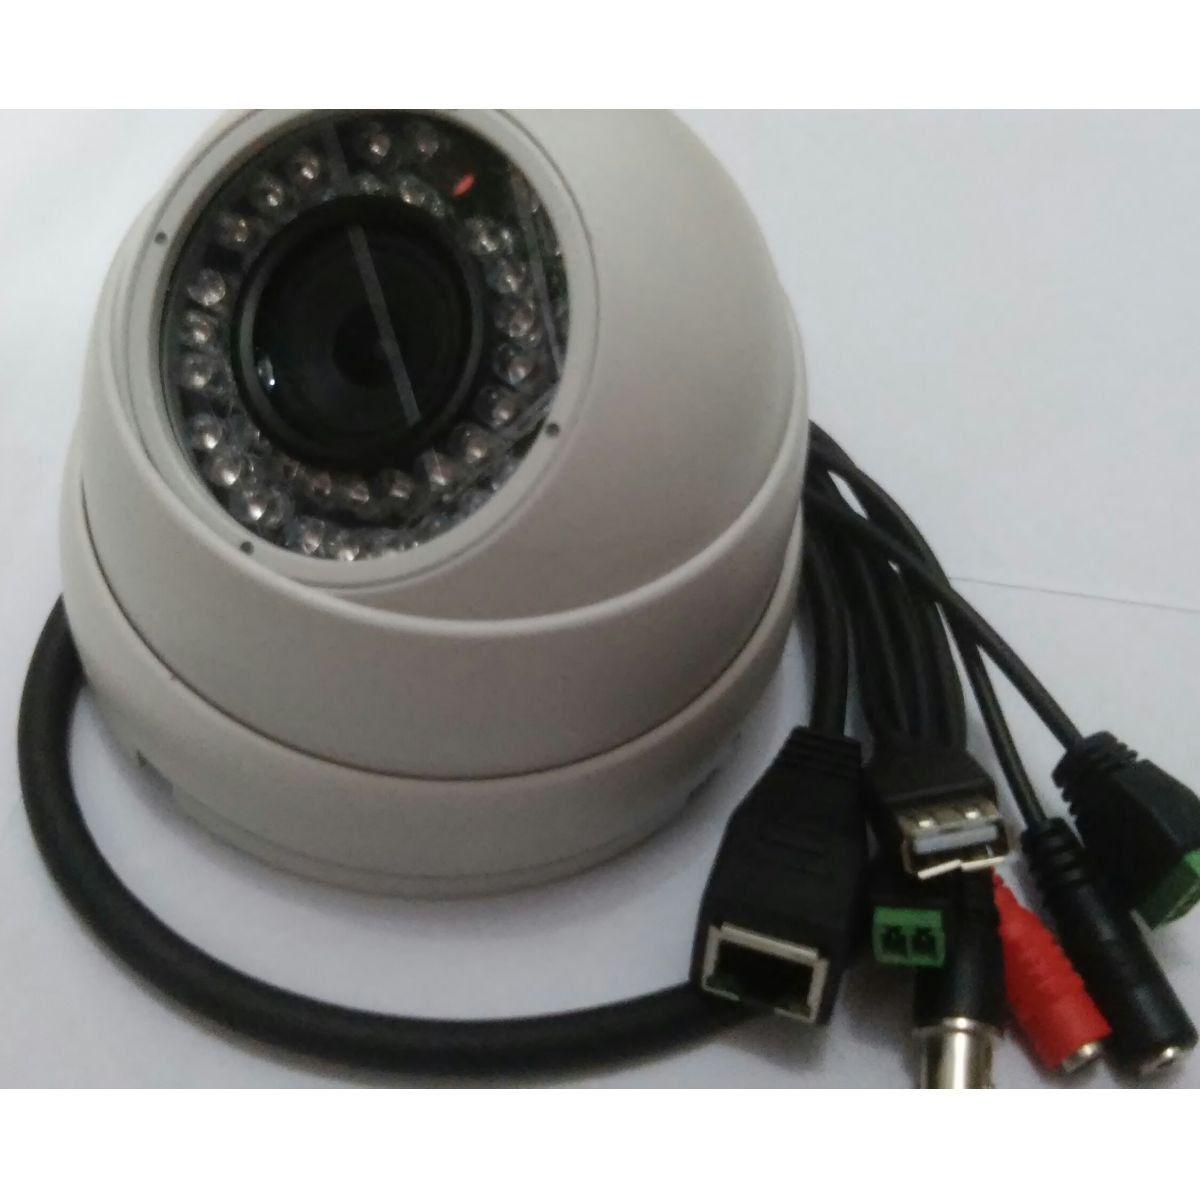 Cftv Camera Infra Ip Hd Wdr - Lente Fixa Dome Gsip1000dwdr